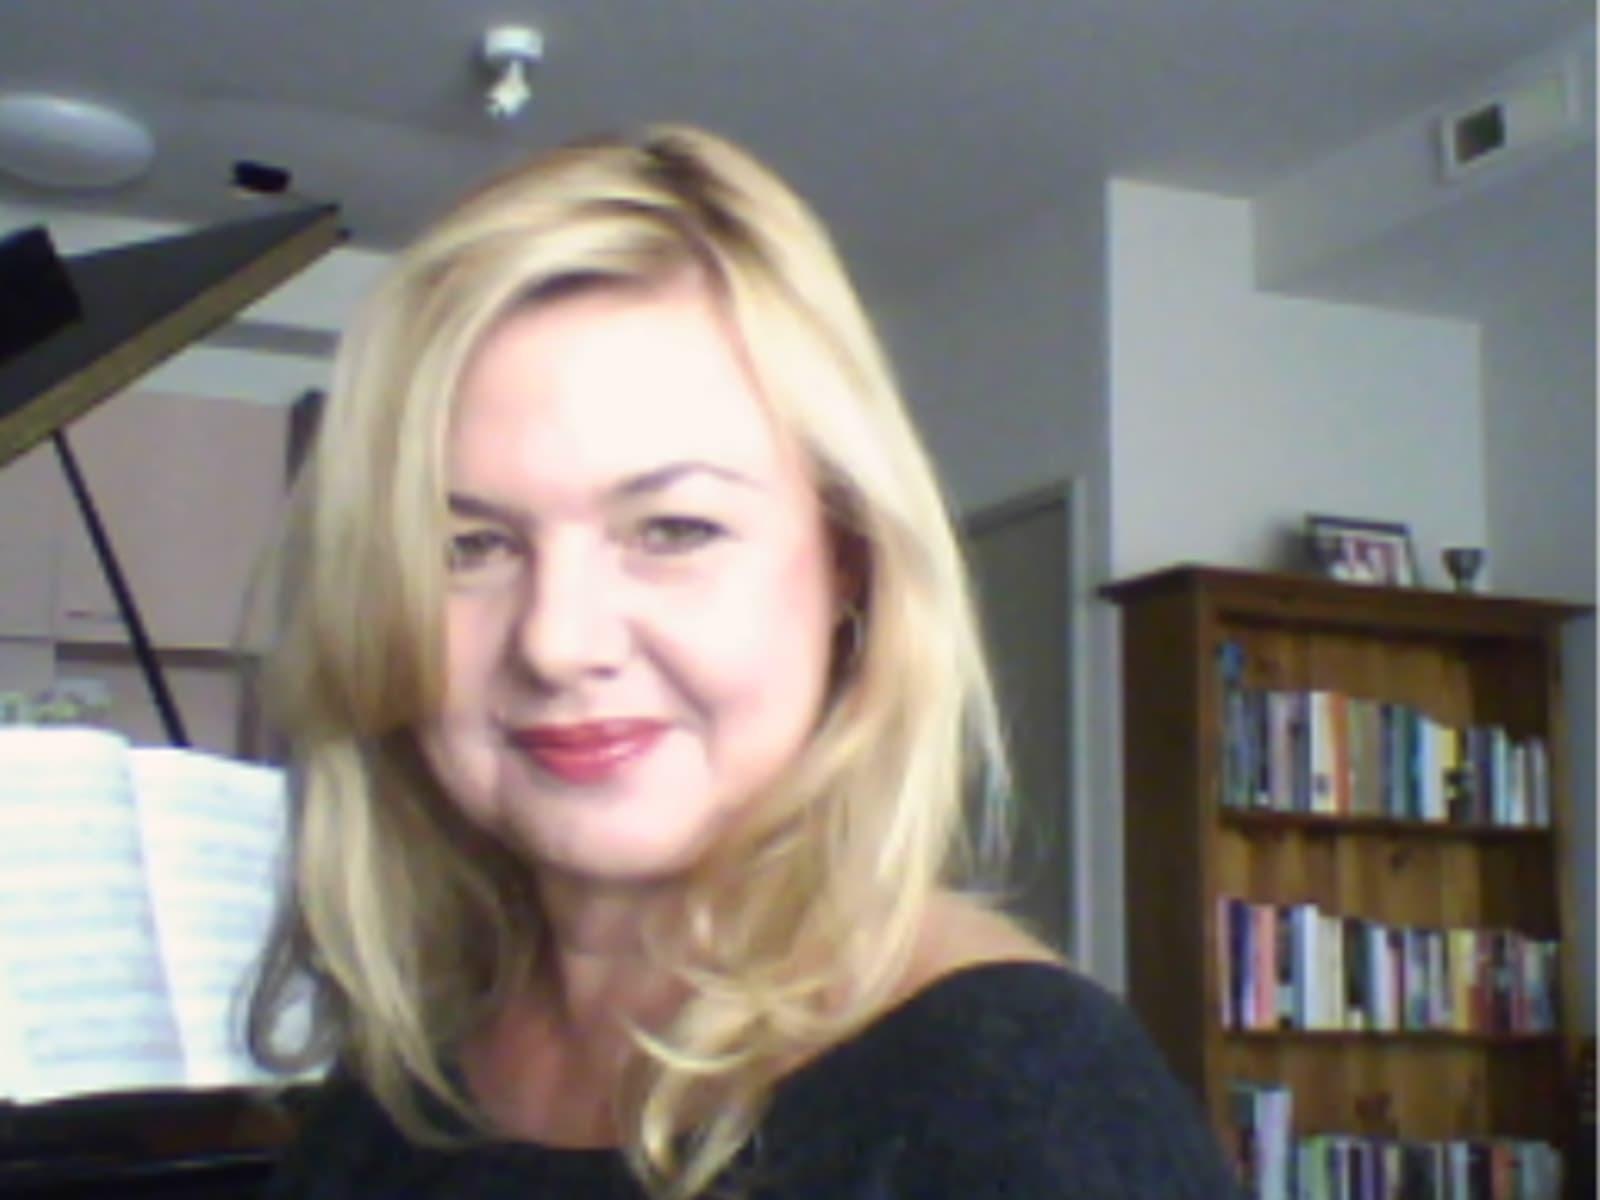 Caroline from Melbourne, Victoria, Australia